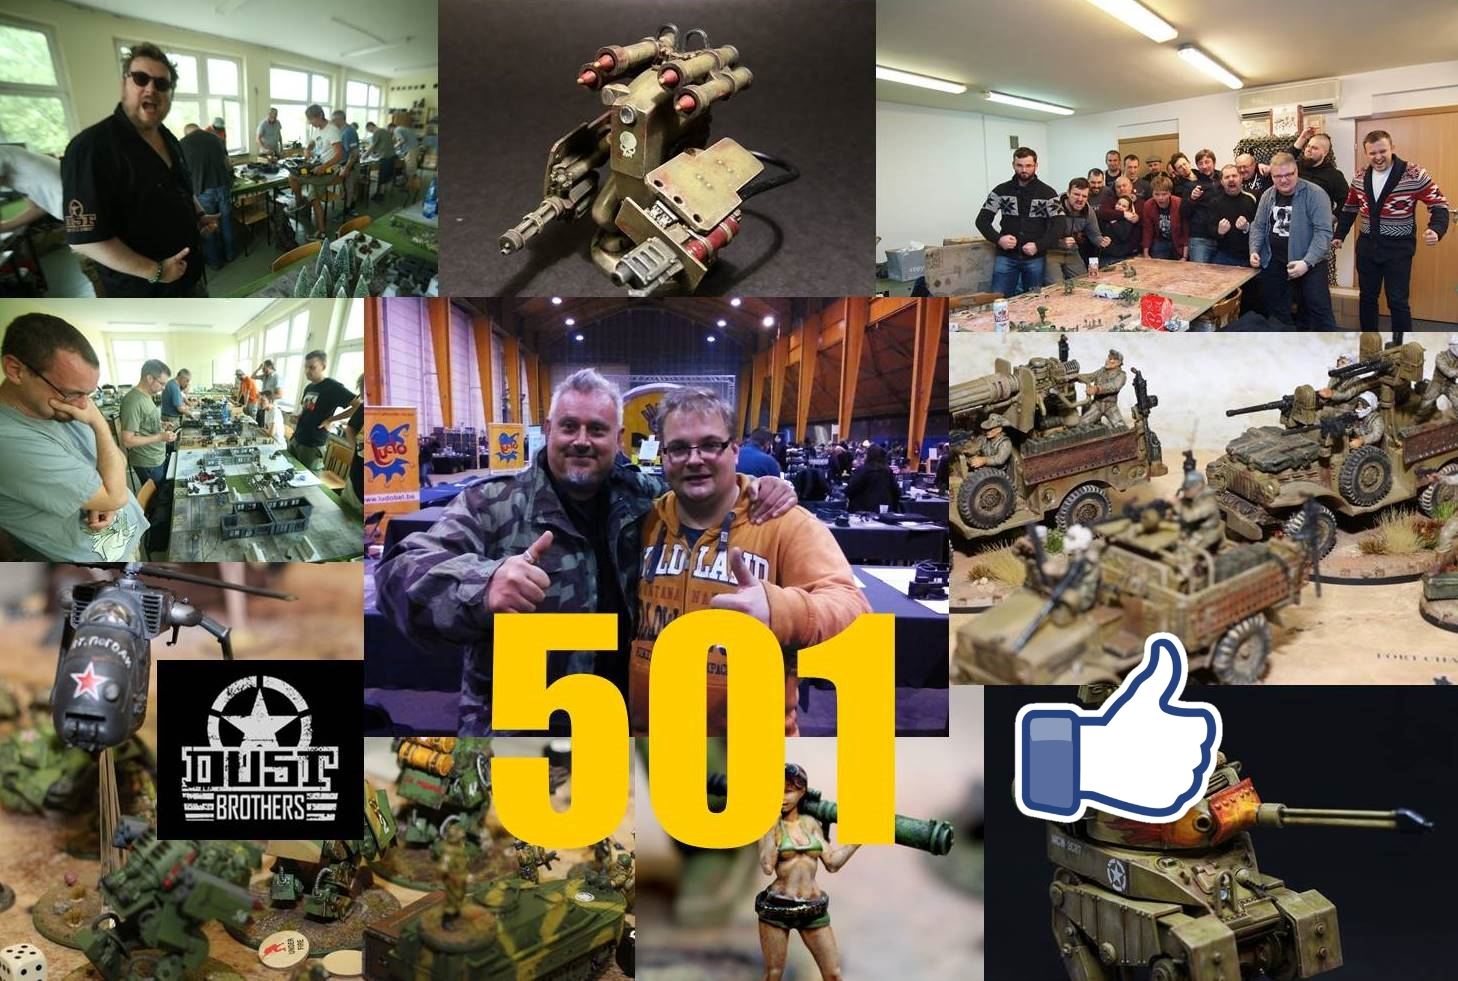 501 likes :)